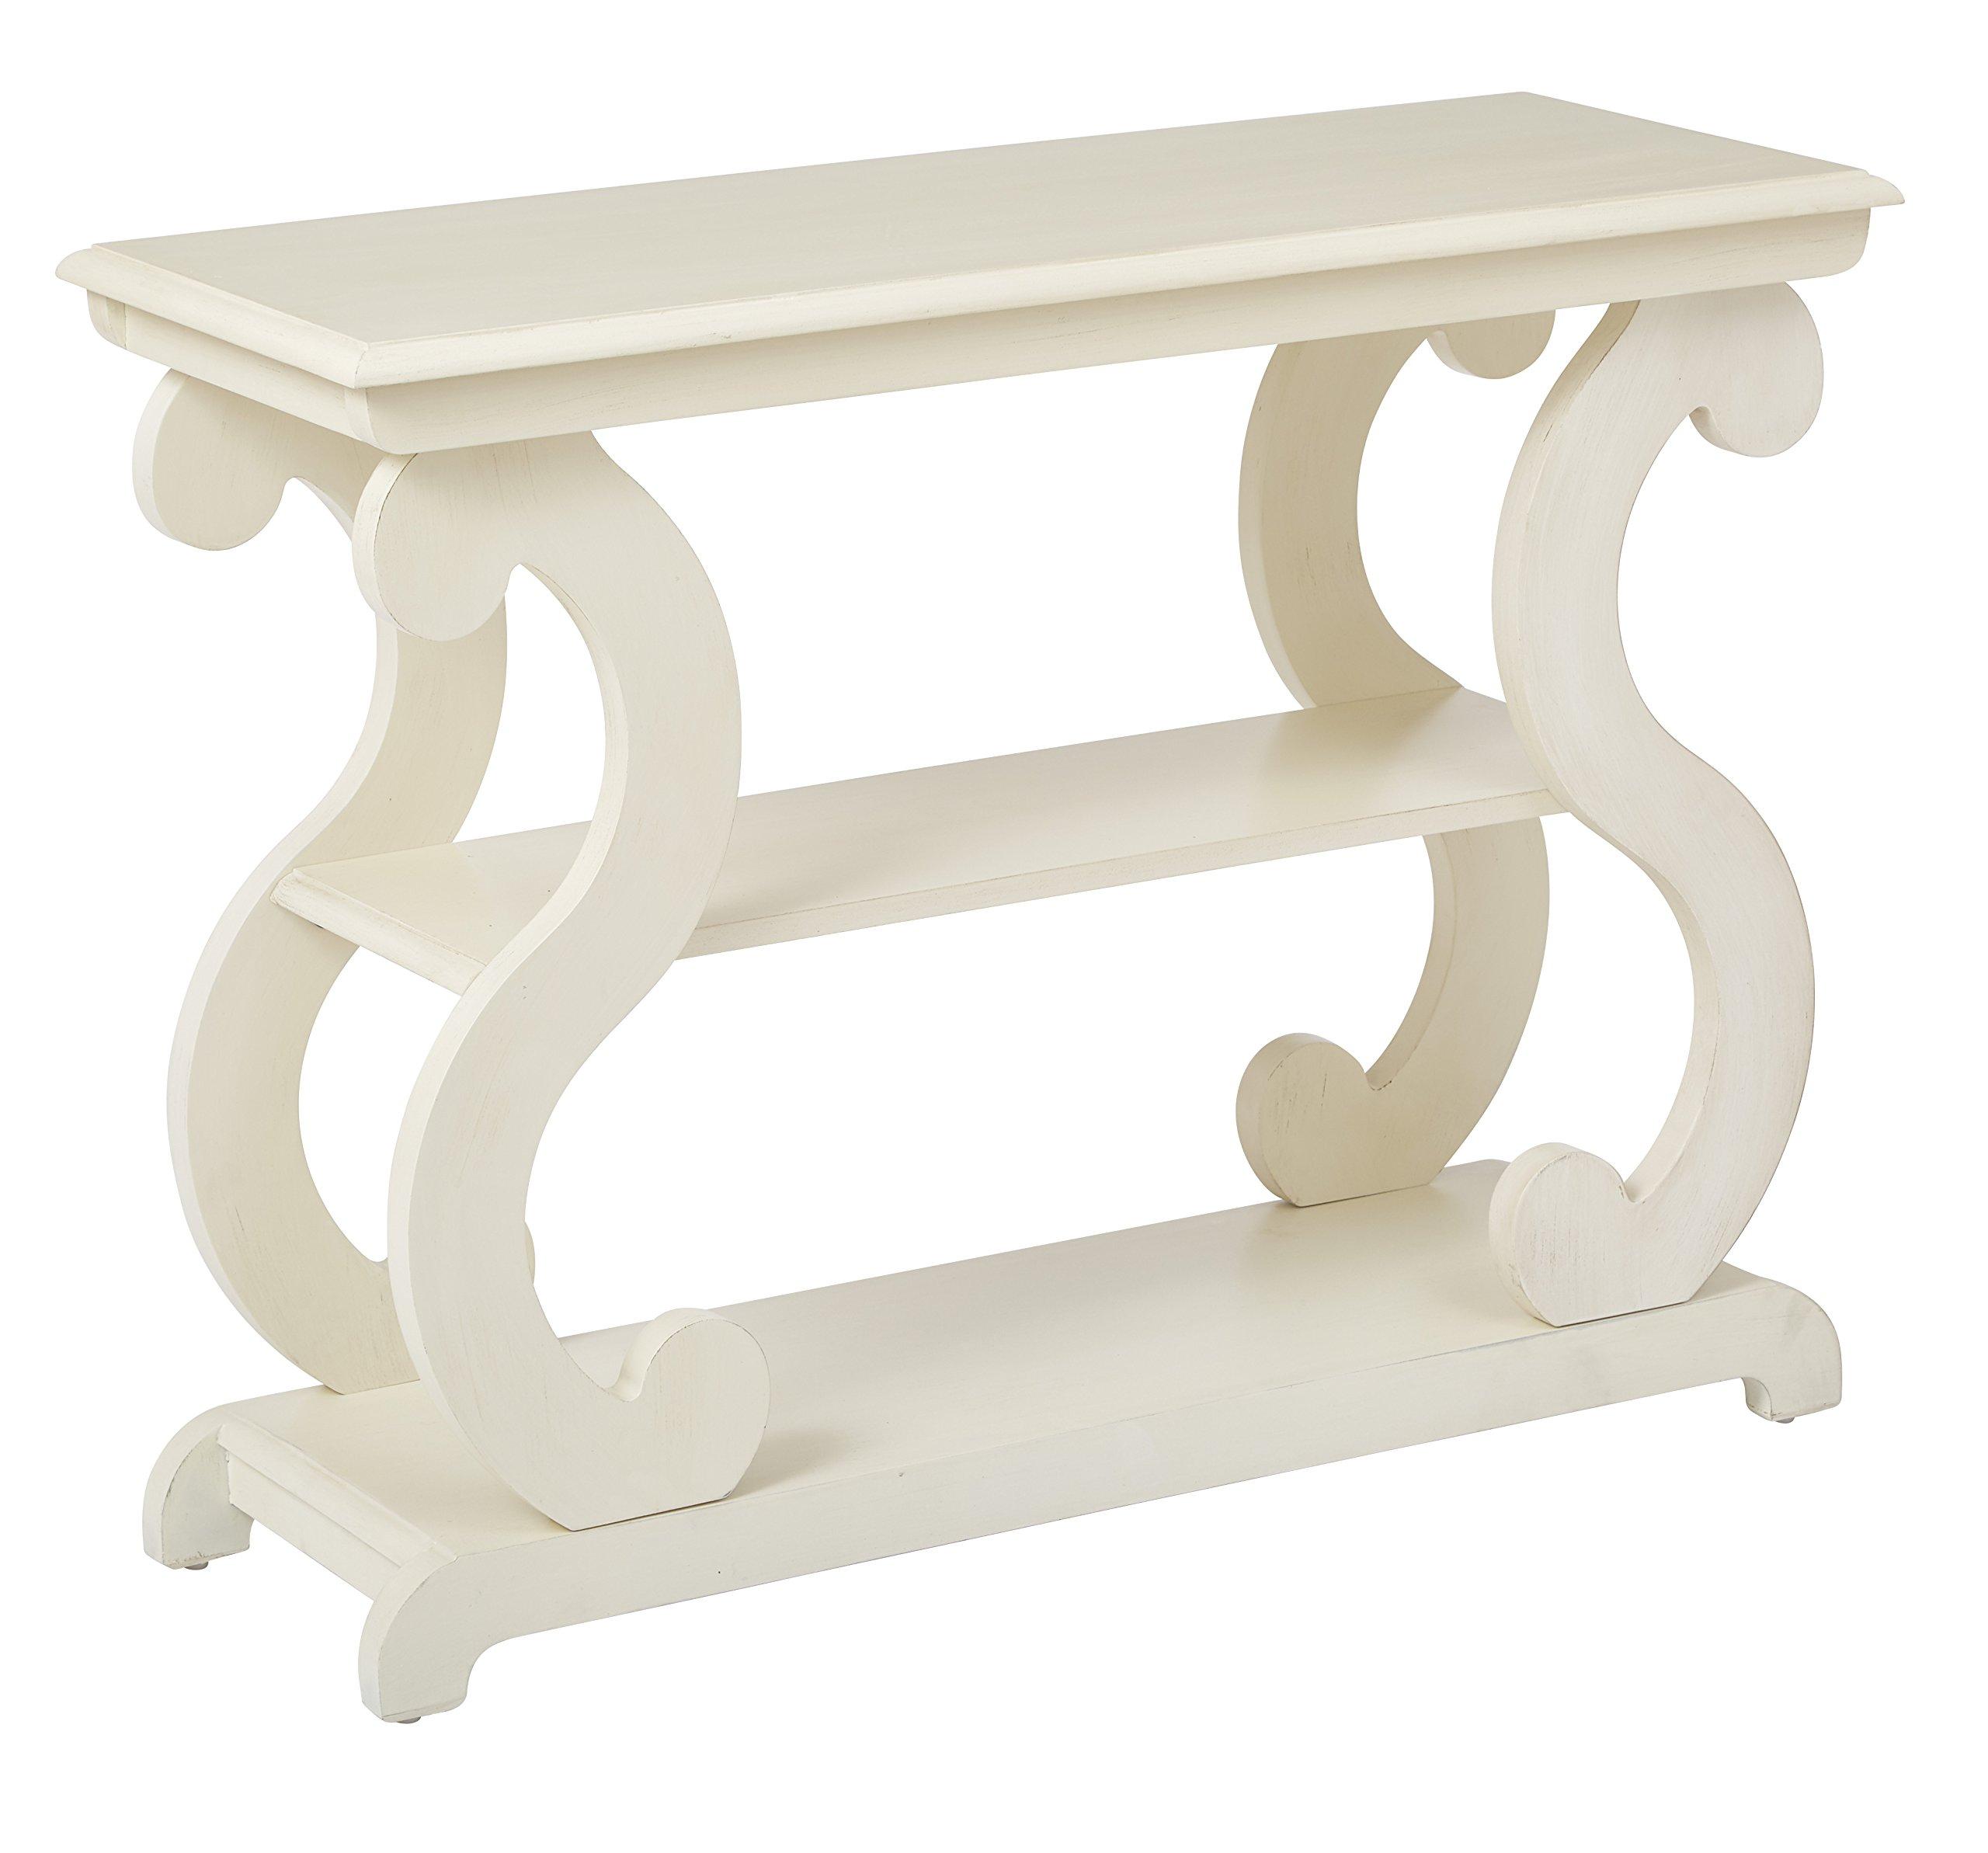 OSP Designs Ashland Console Table, Antique Beige